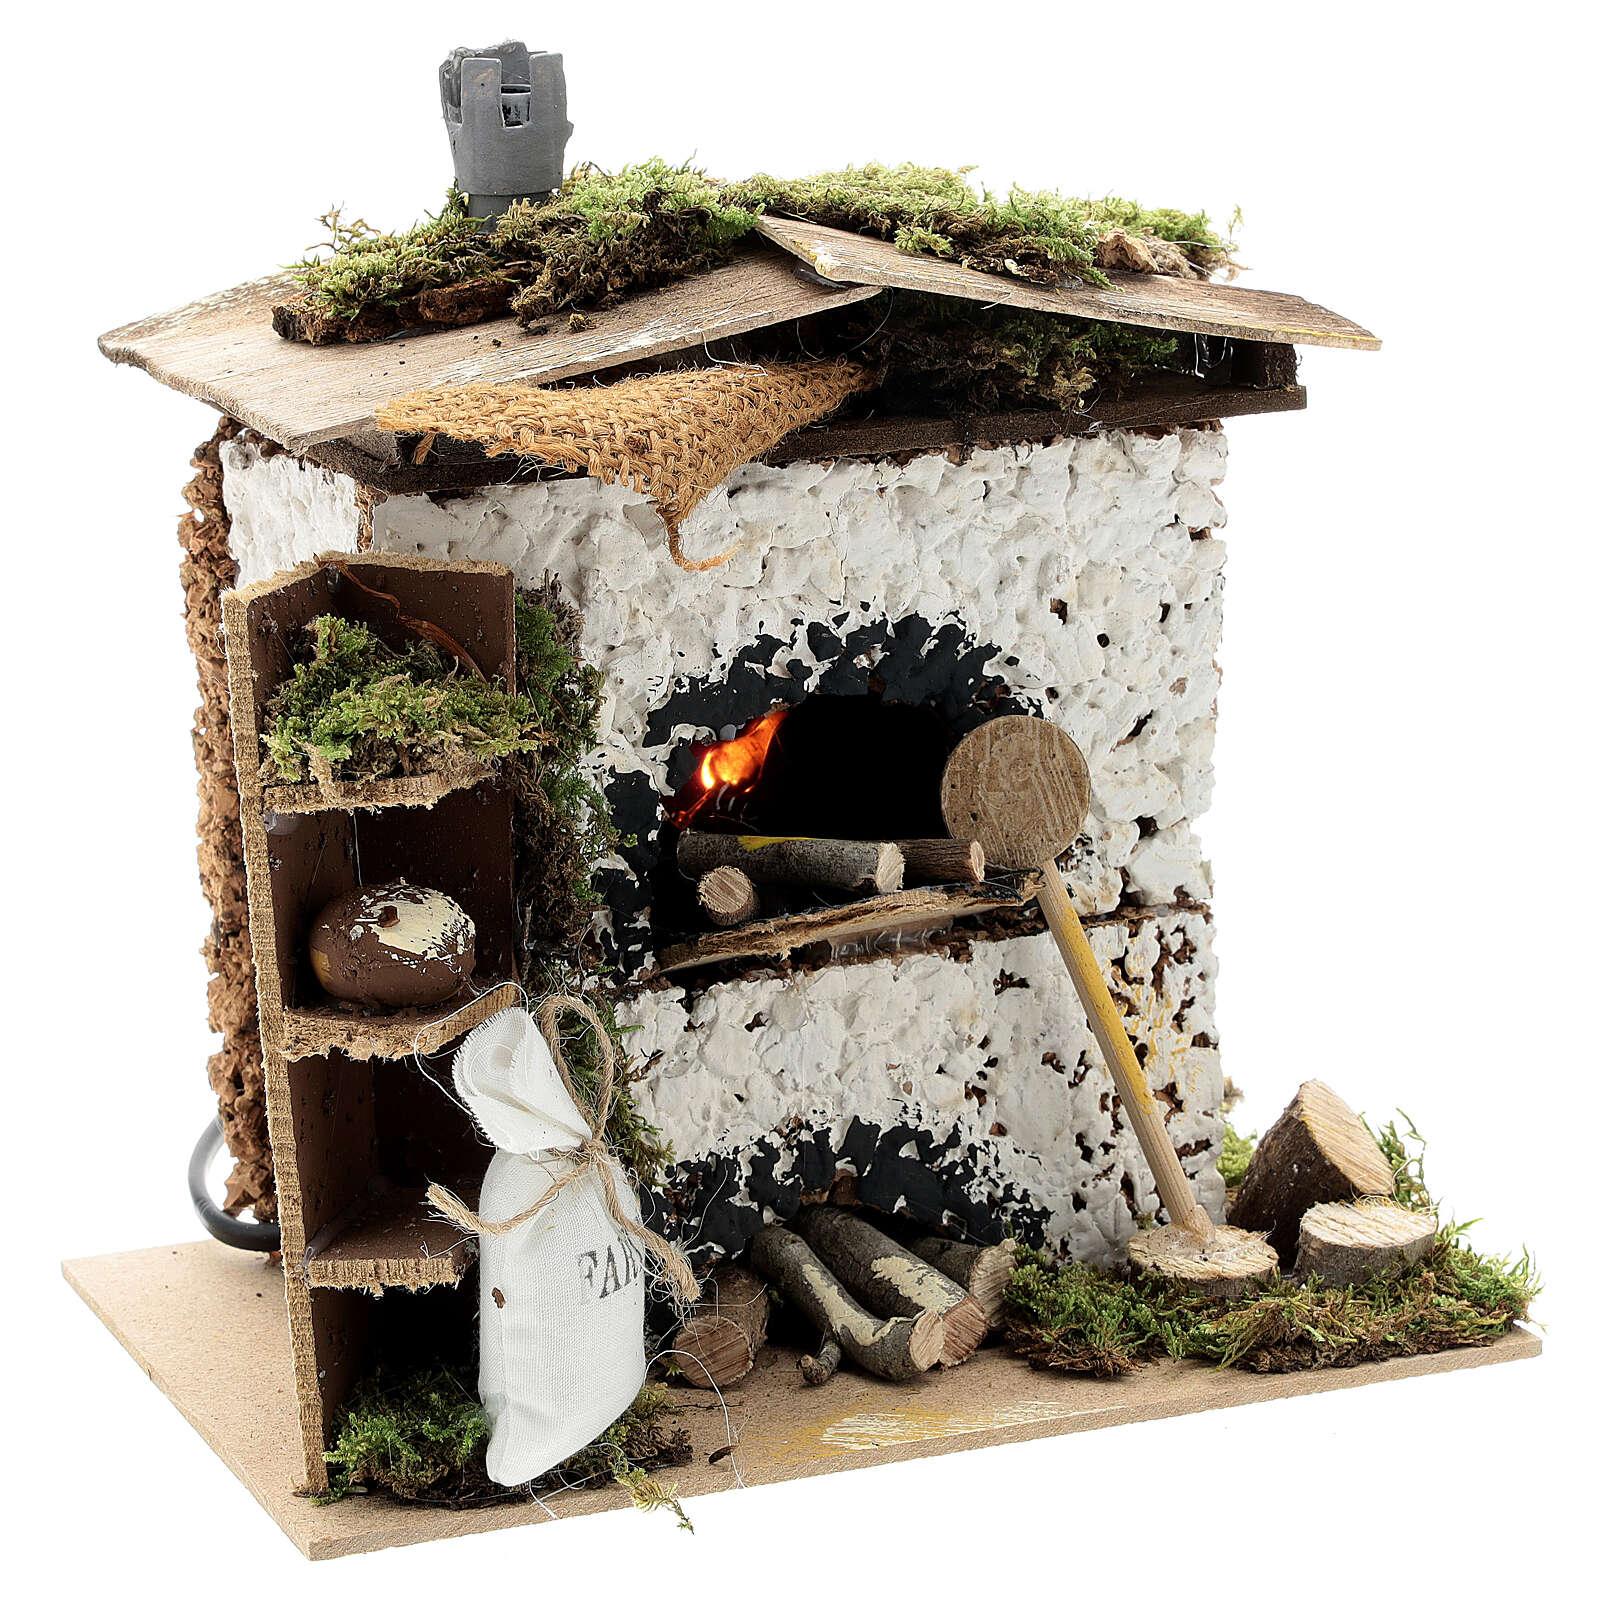 Brick oven figurine house FLICKERING FIRE LIGHT 20x20x15 cm nativity 12 cm 4